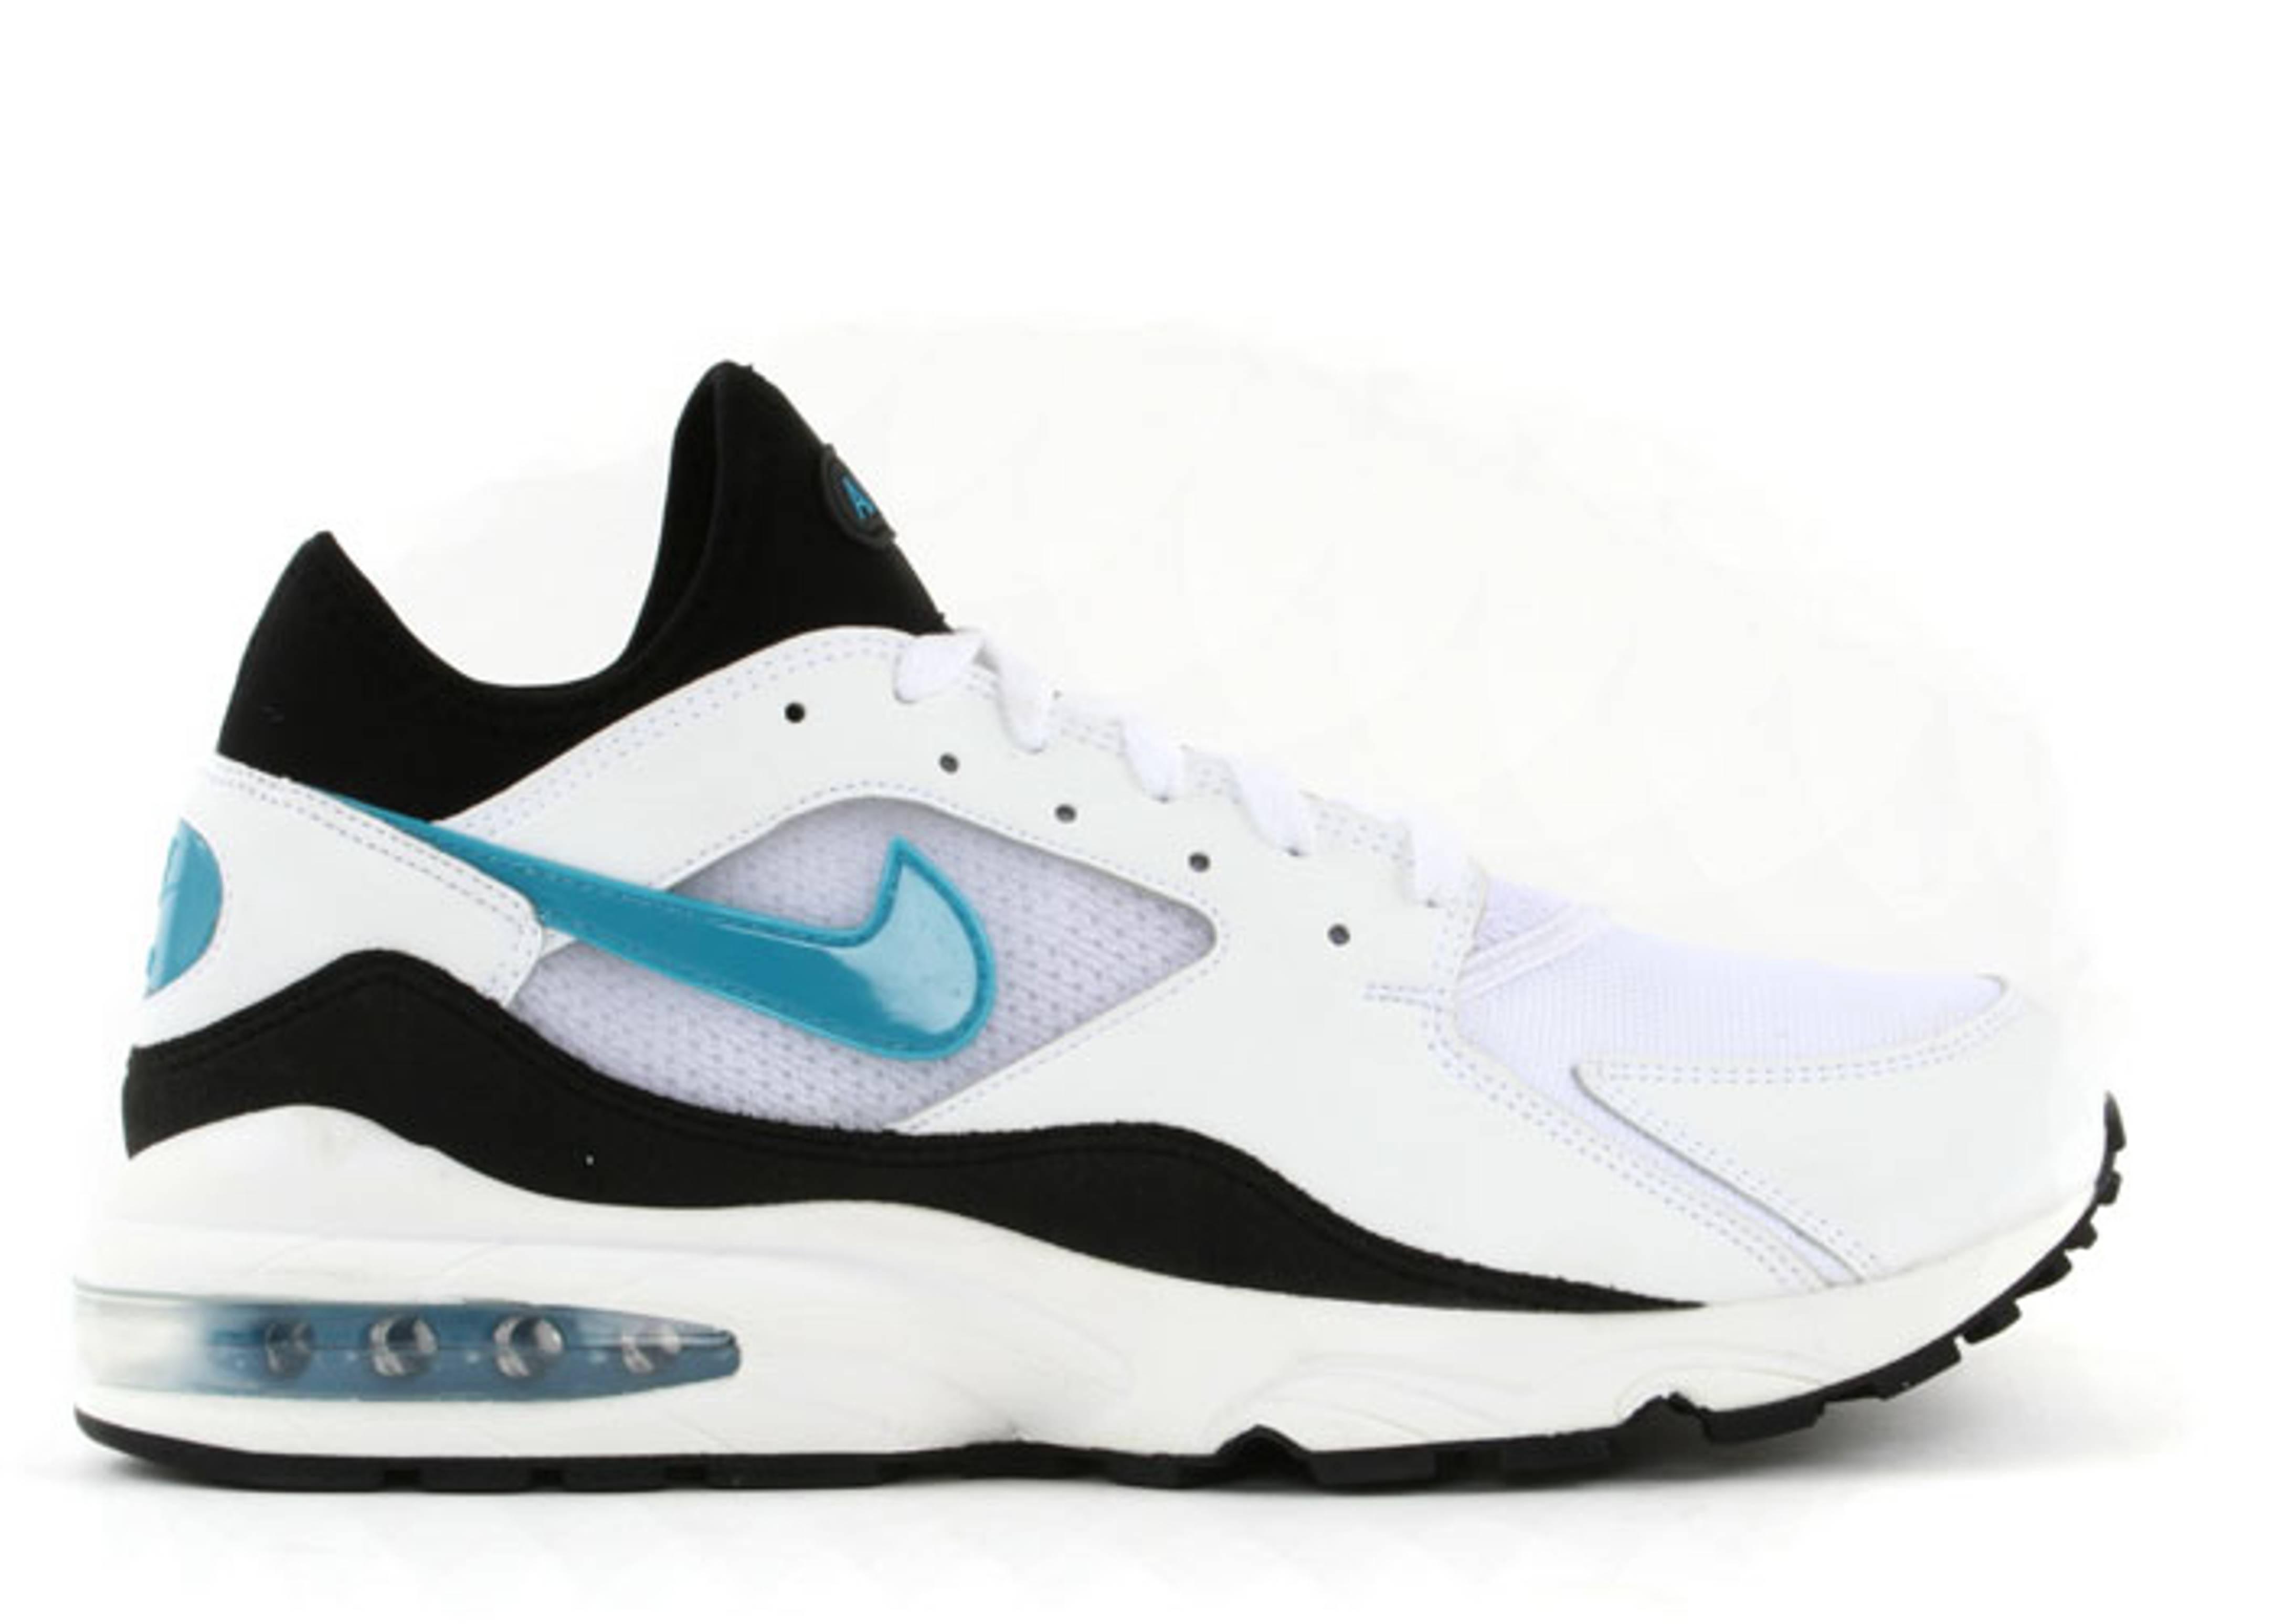 b8b160230de2 Air Max 93 Classic - Nike - 313095 141 - white laser blue-black ...